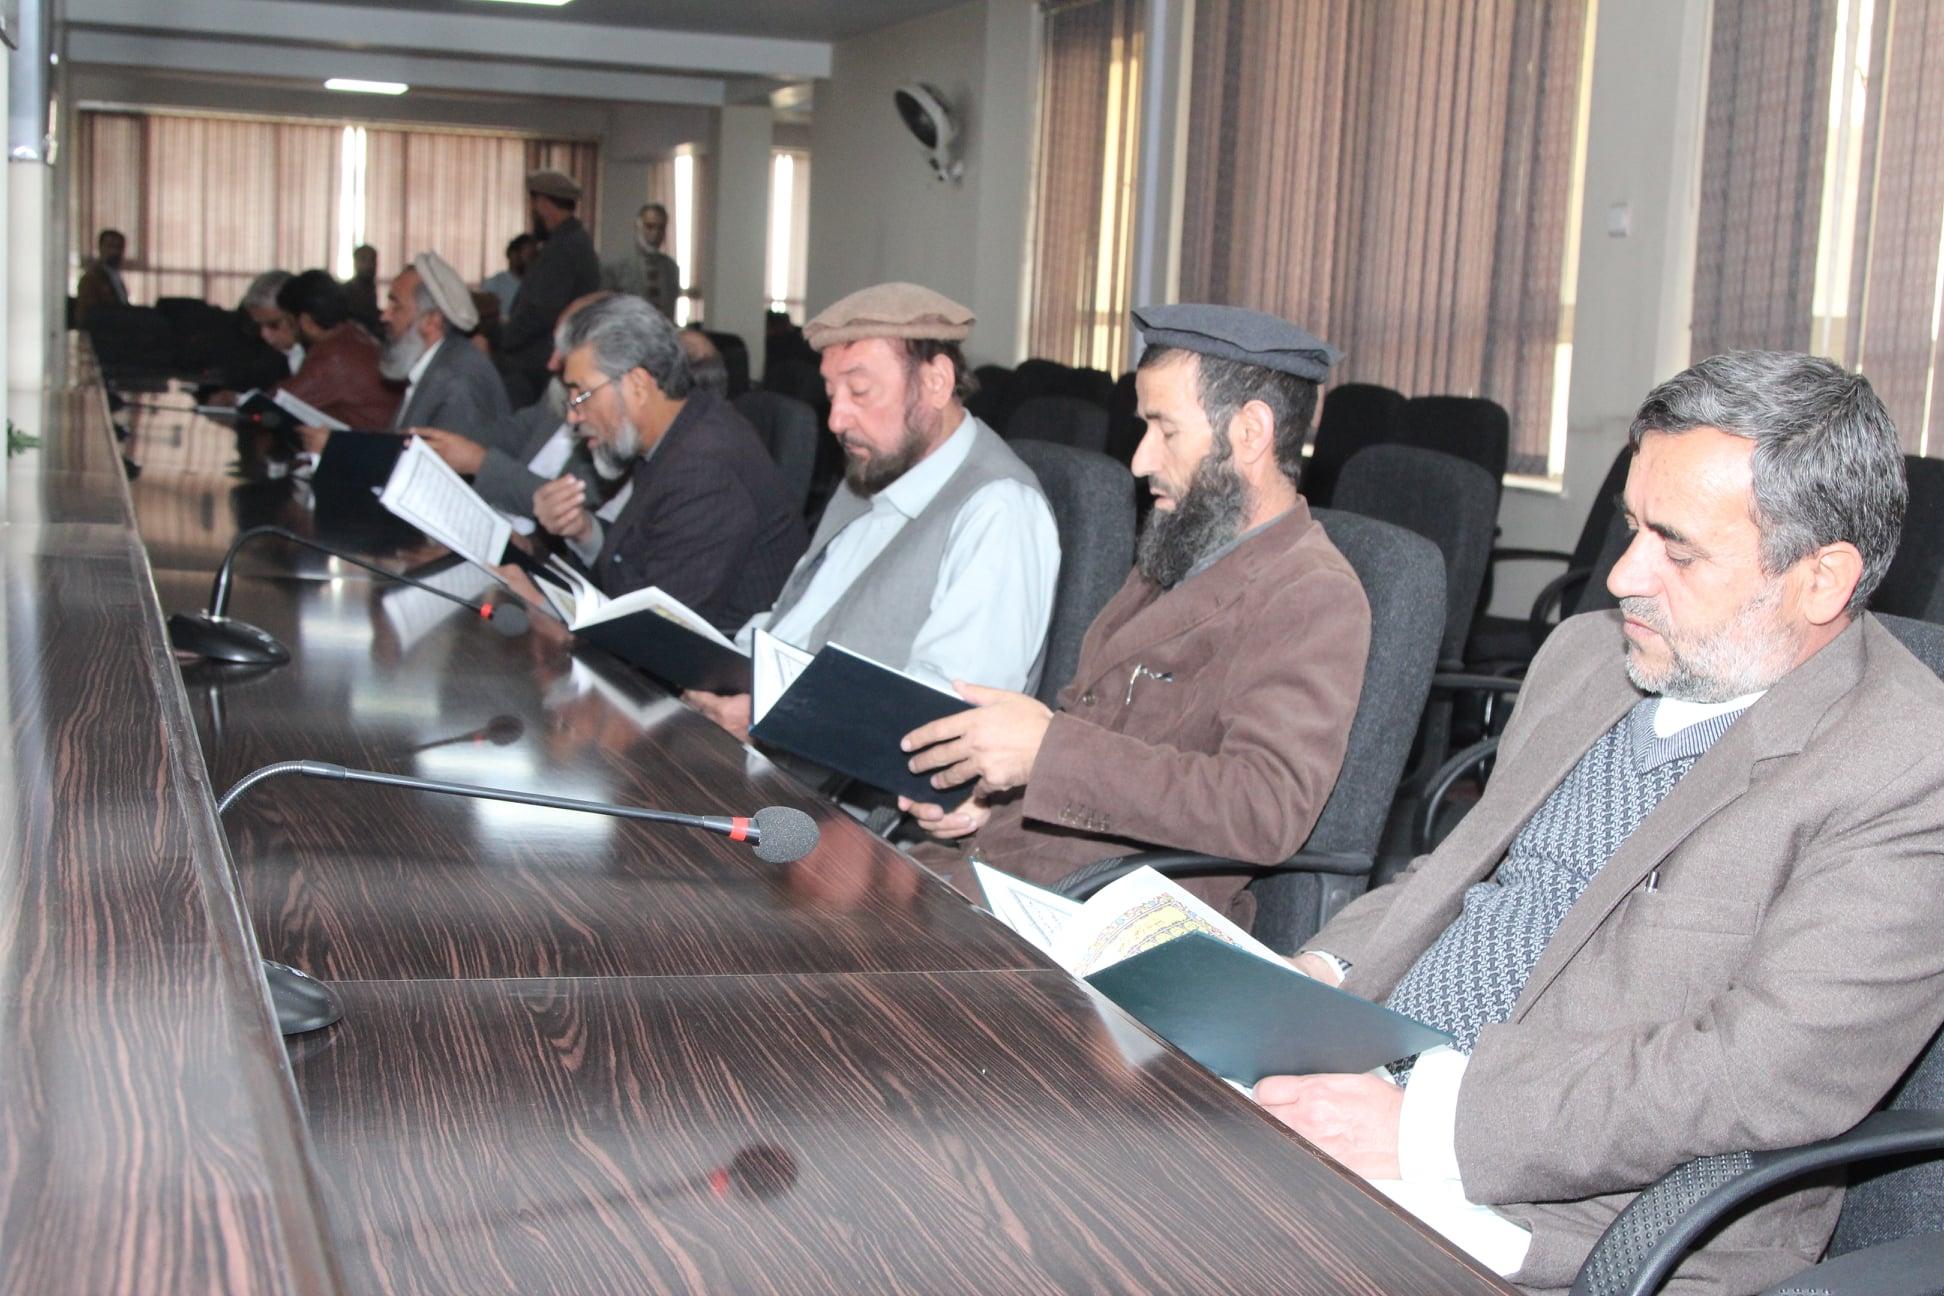 ختم قرآن عظیم الشان به مناسبت میلاد با سعادت پیغمبر بزرگوار اسلام صورت گرفت